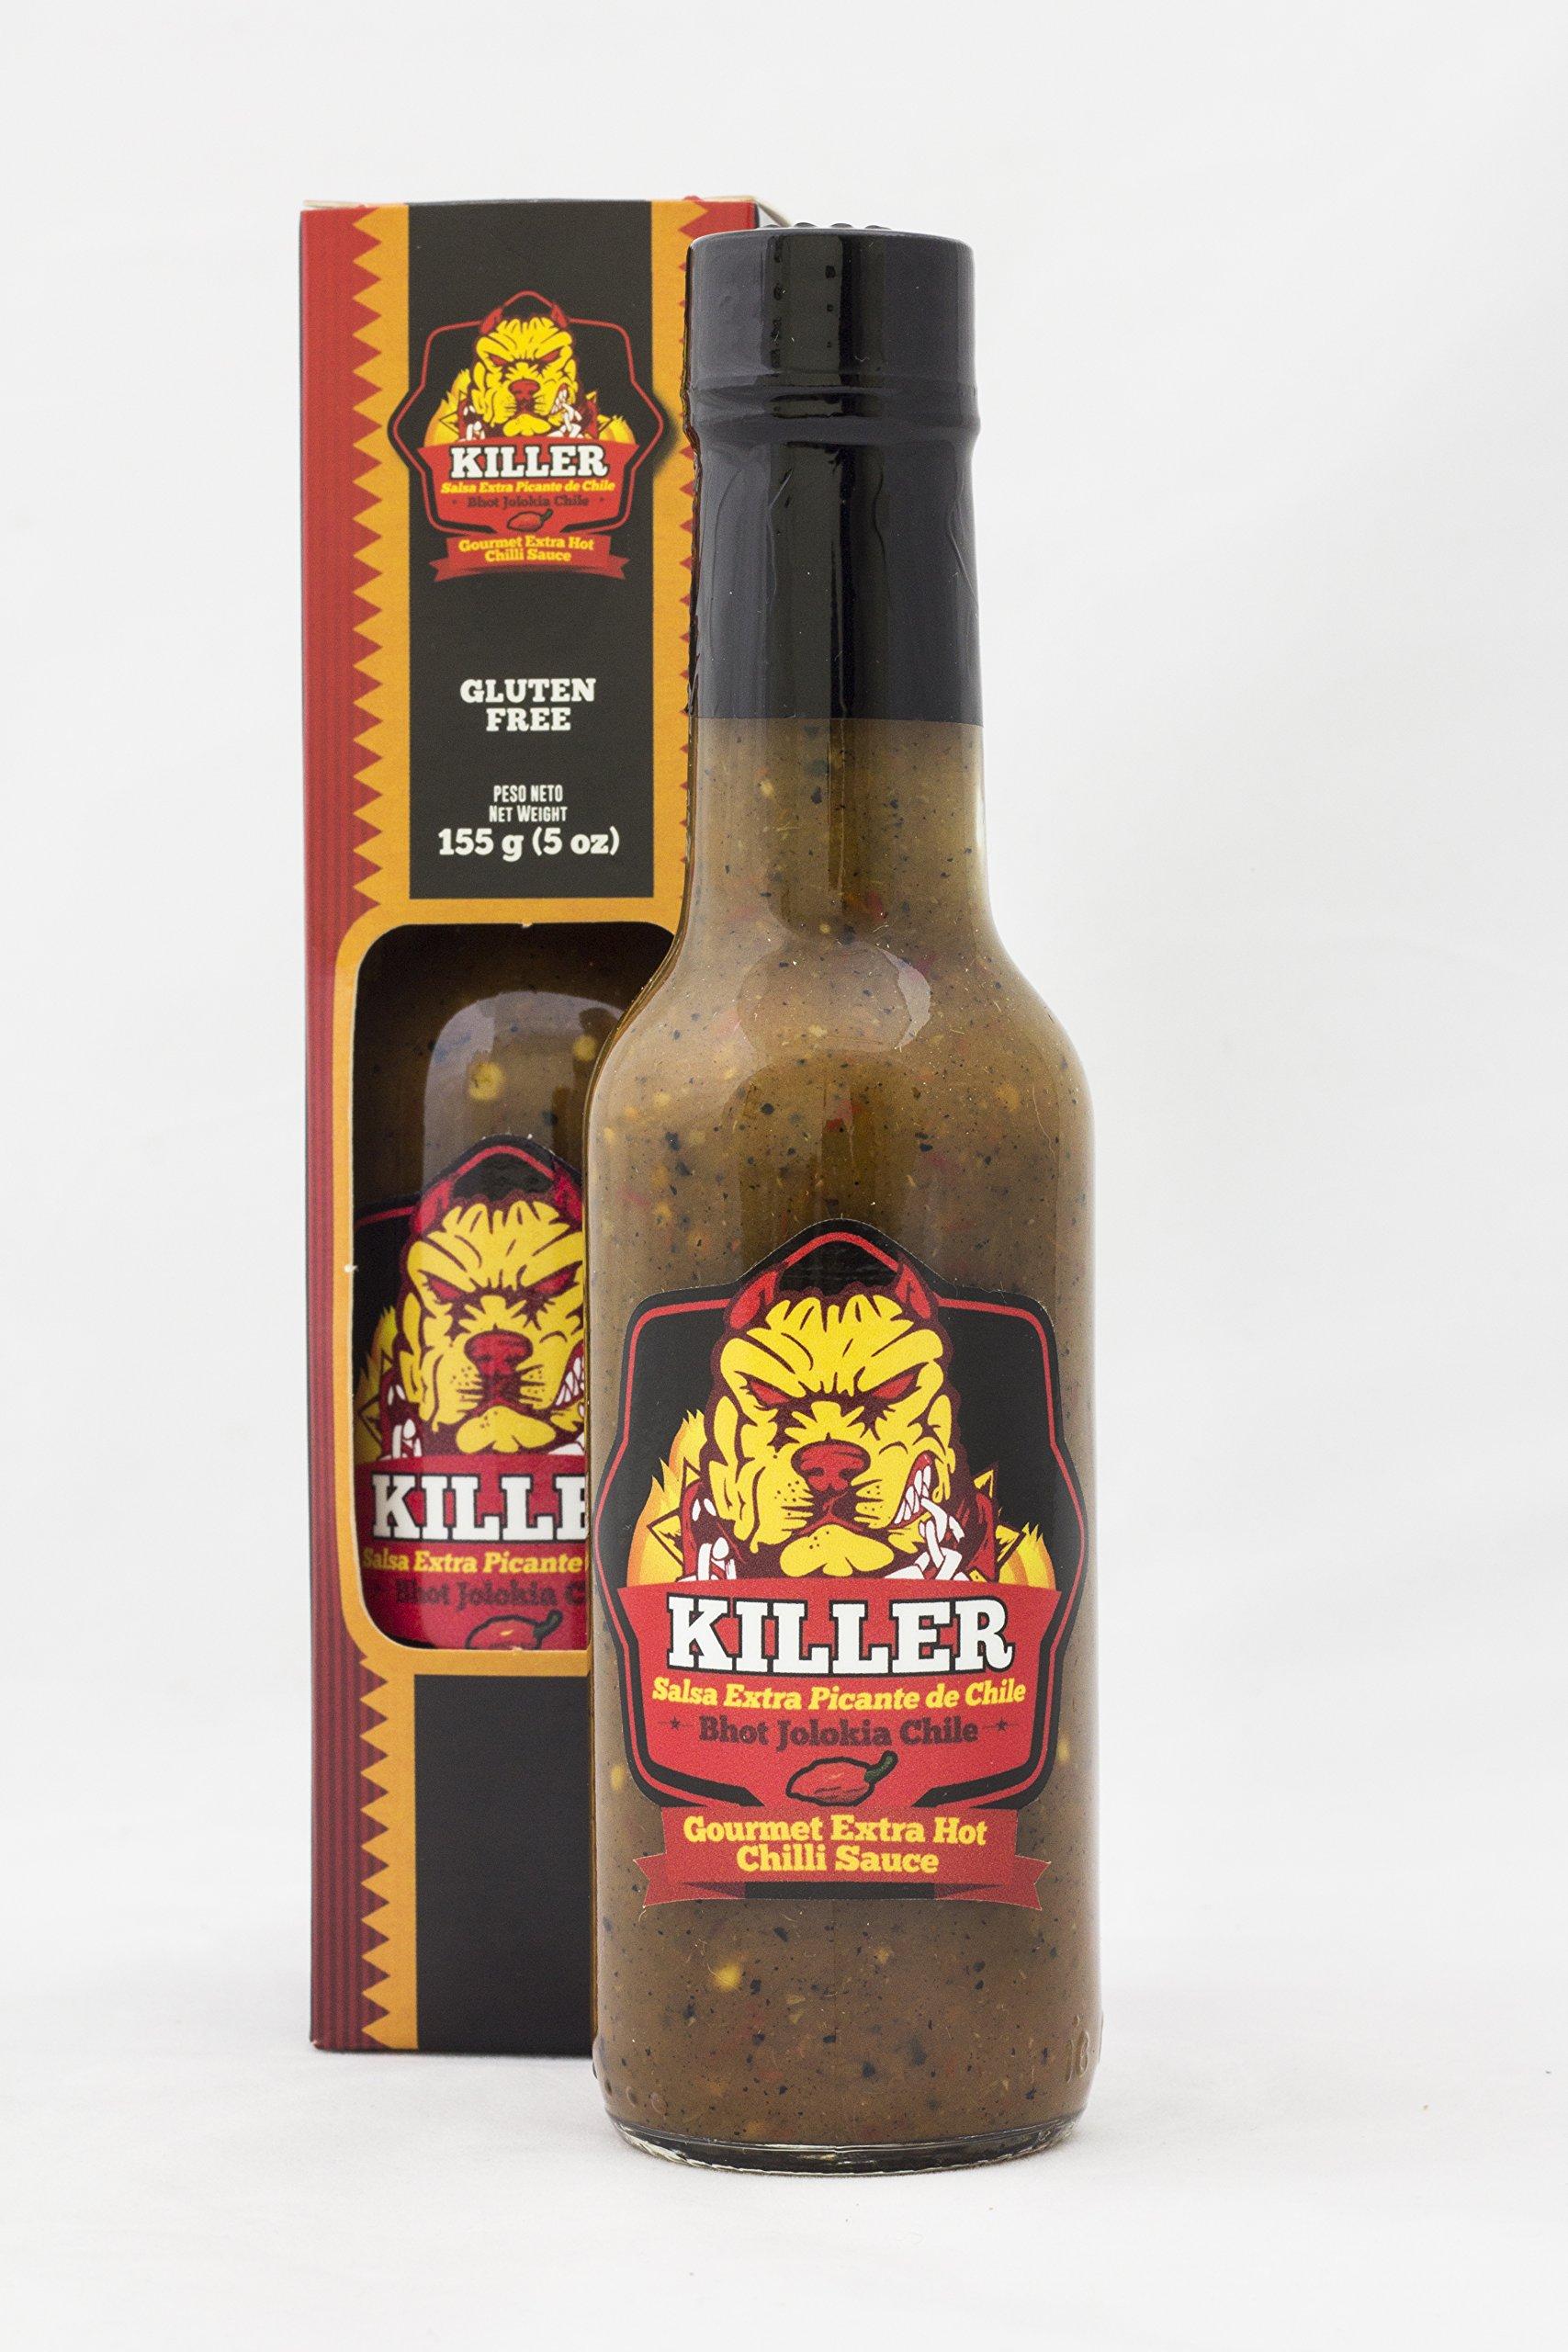 Blue Zone Killer Natural Costa Rican Hot Chili Pepper Sauce - Extra Hot (155g/5oz)